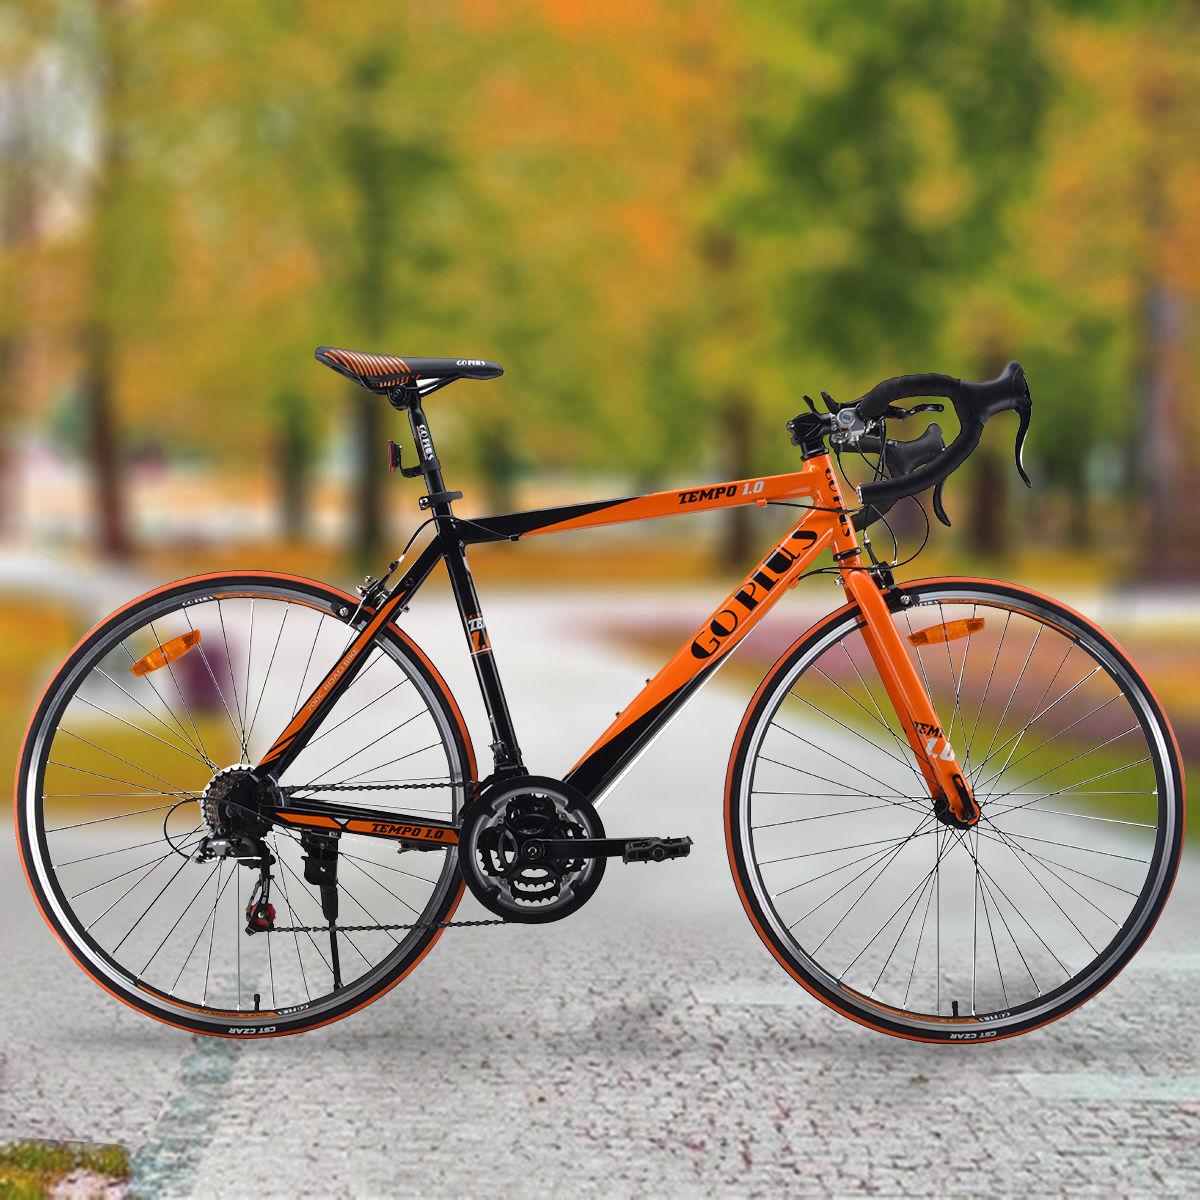 Goplus 700C 52cm Aluminum Road/Commuter Bike Bicycle 21 Speed Quick Release